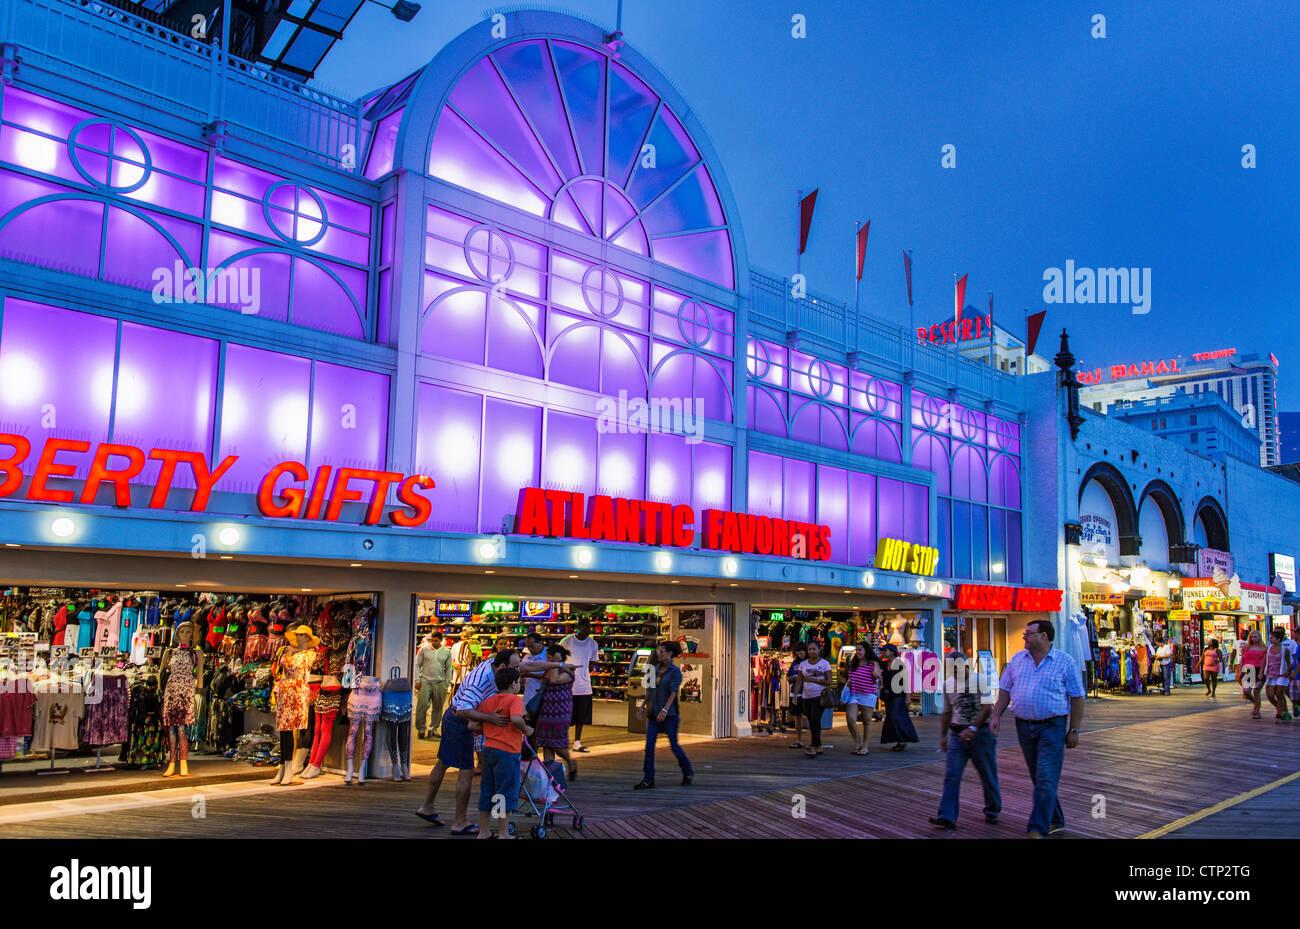 Gift shop on boardwalk, Atlantic City, New Jersey, USA Stock Photo ...